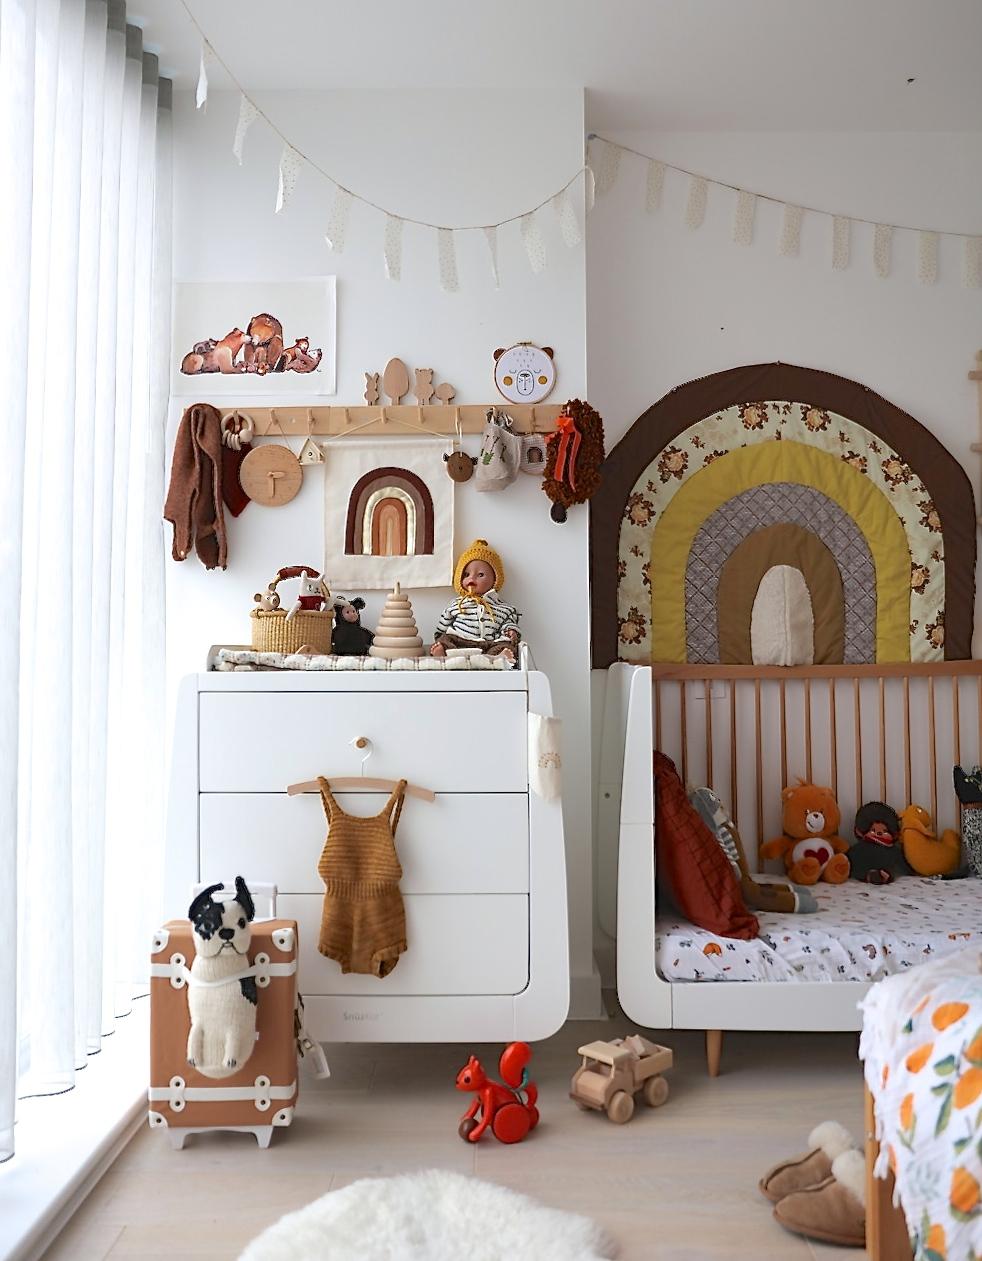 Chloe Uber Kid - My Rainbow Nursery - Blog Post - November 2018